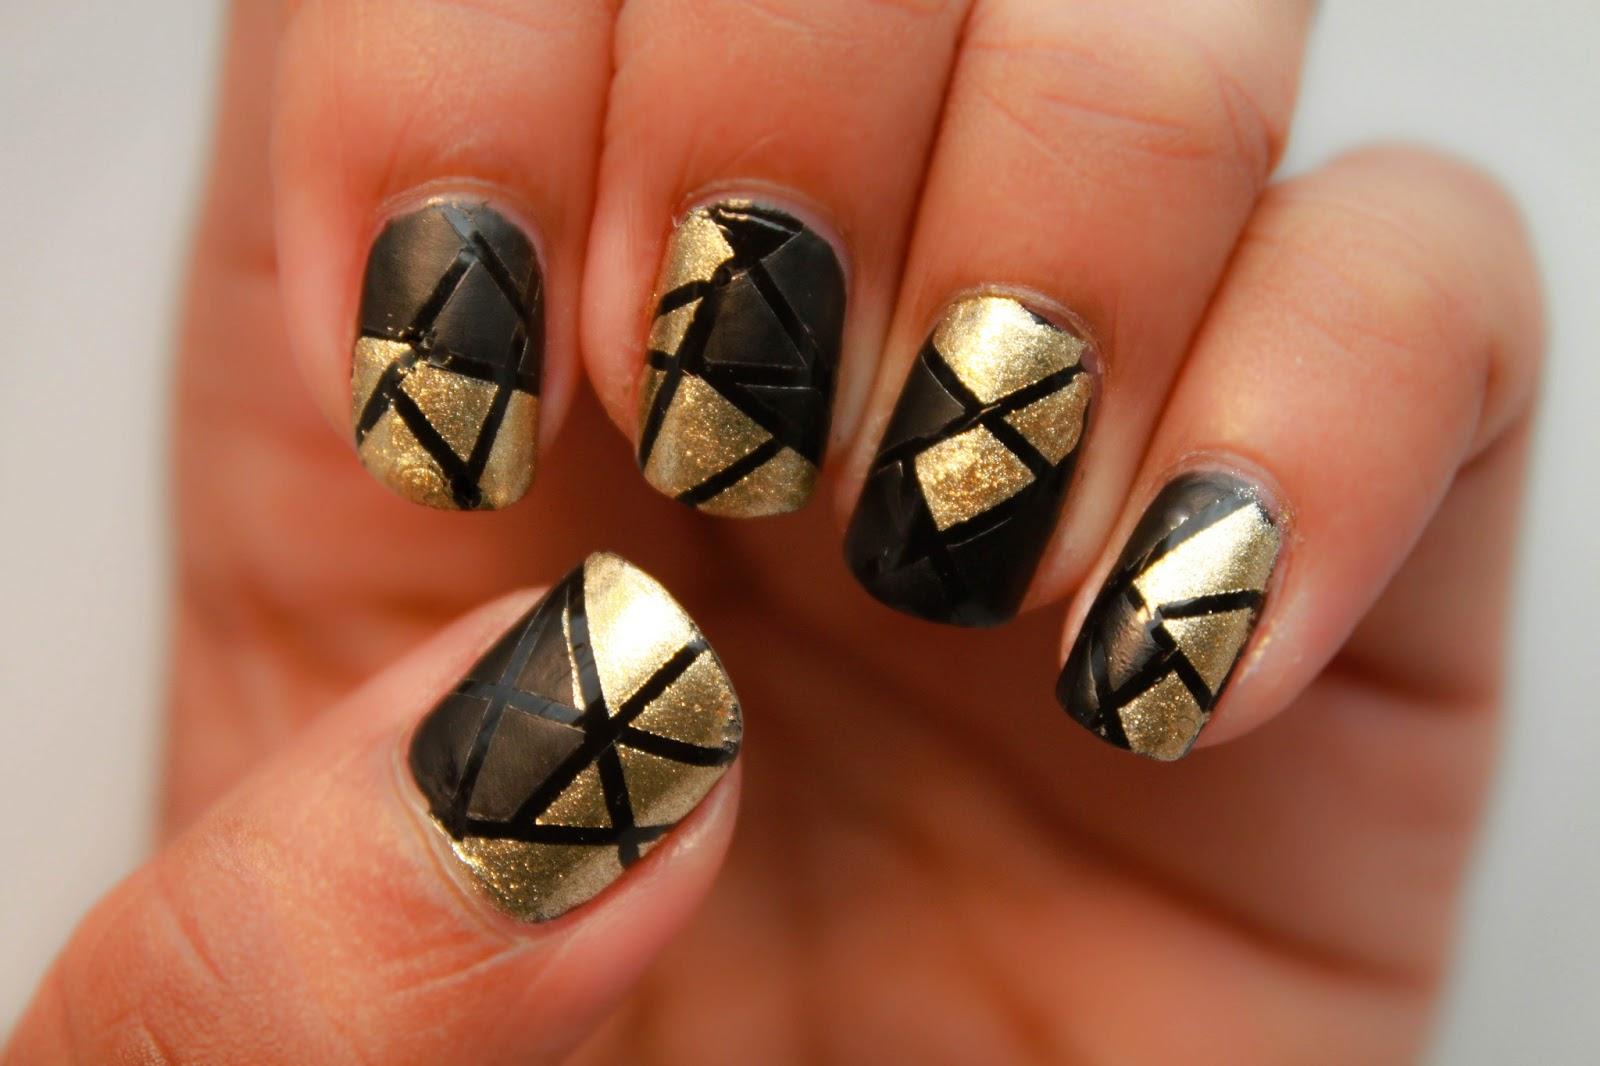 Black dress nails - Gold Dress Nails Painted